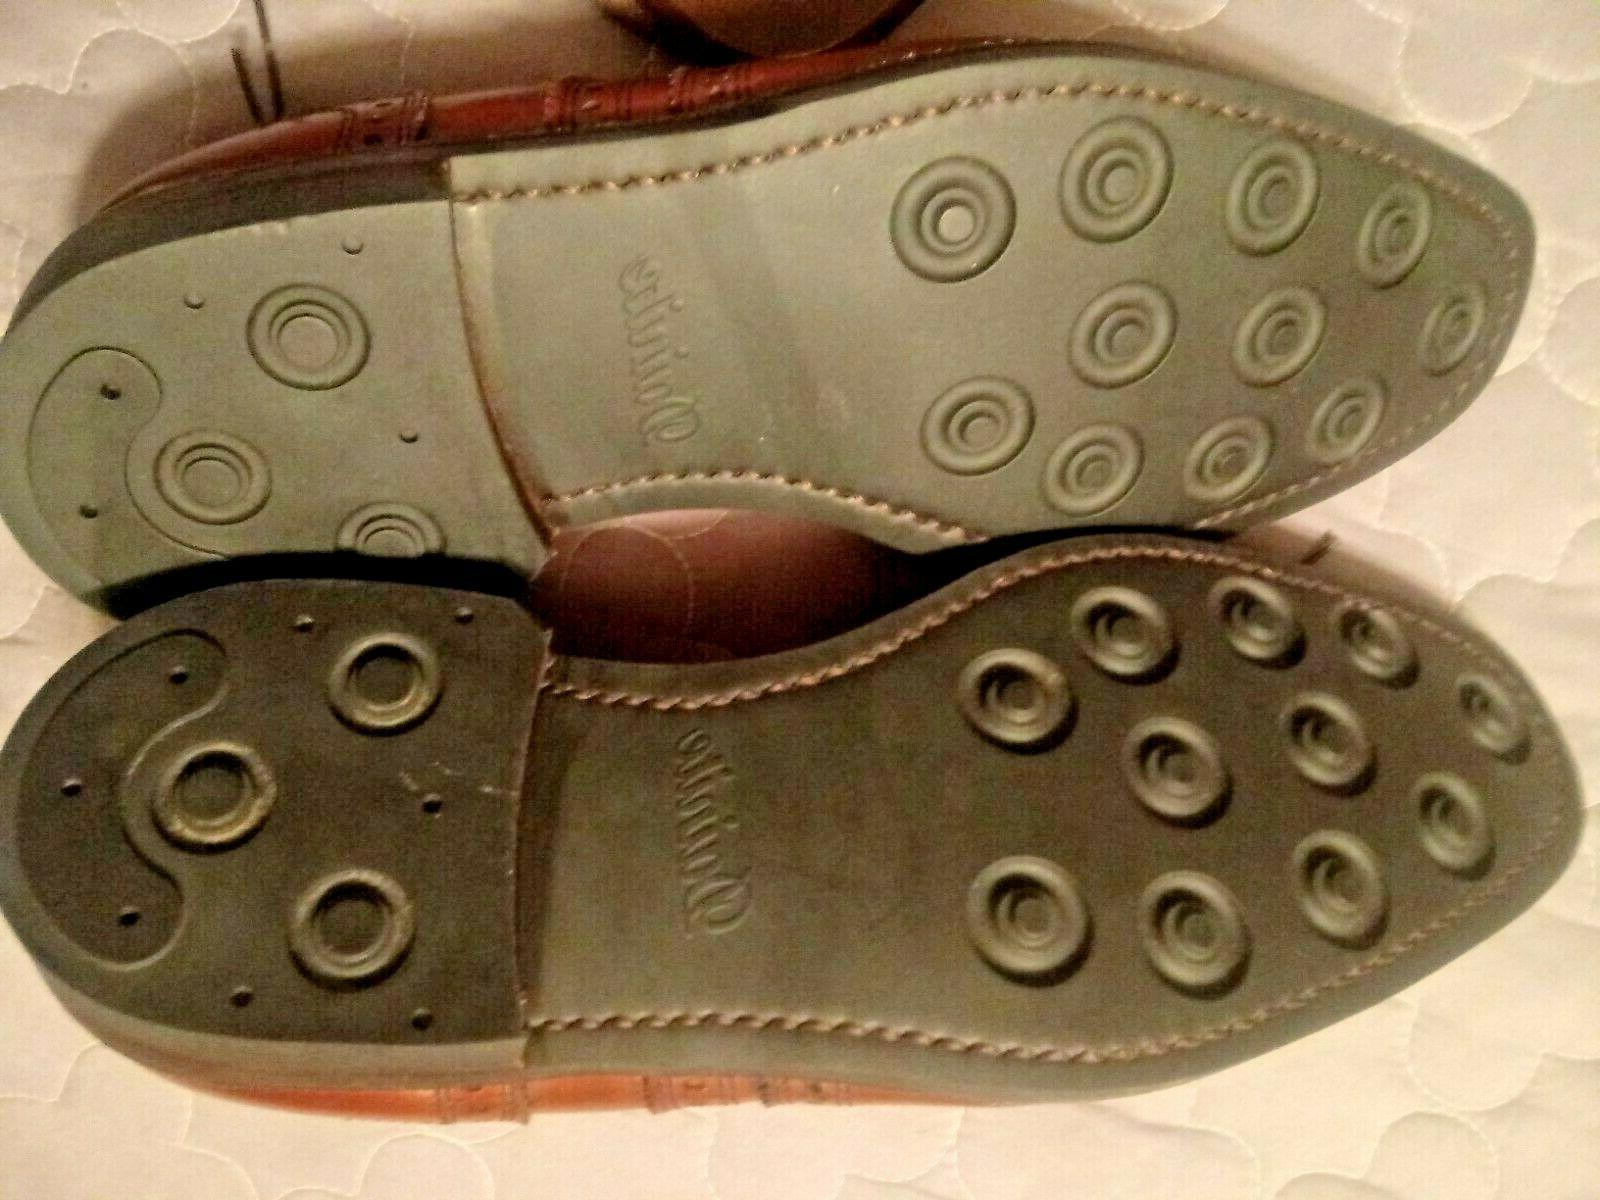 Allen University dark chili oxfords dress shoes Sz